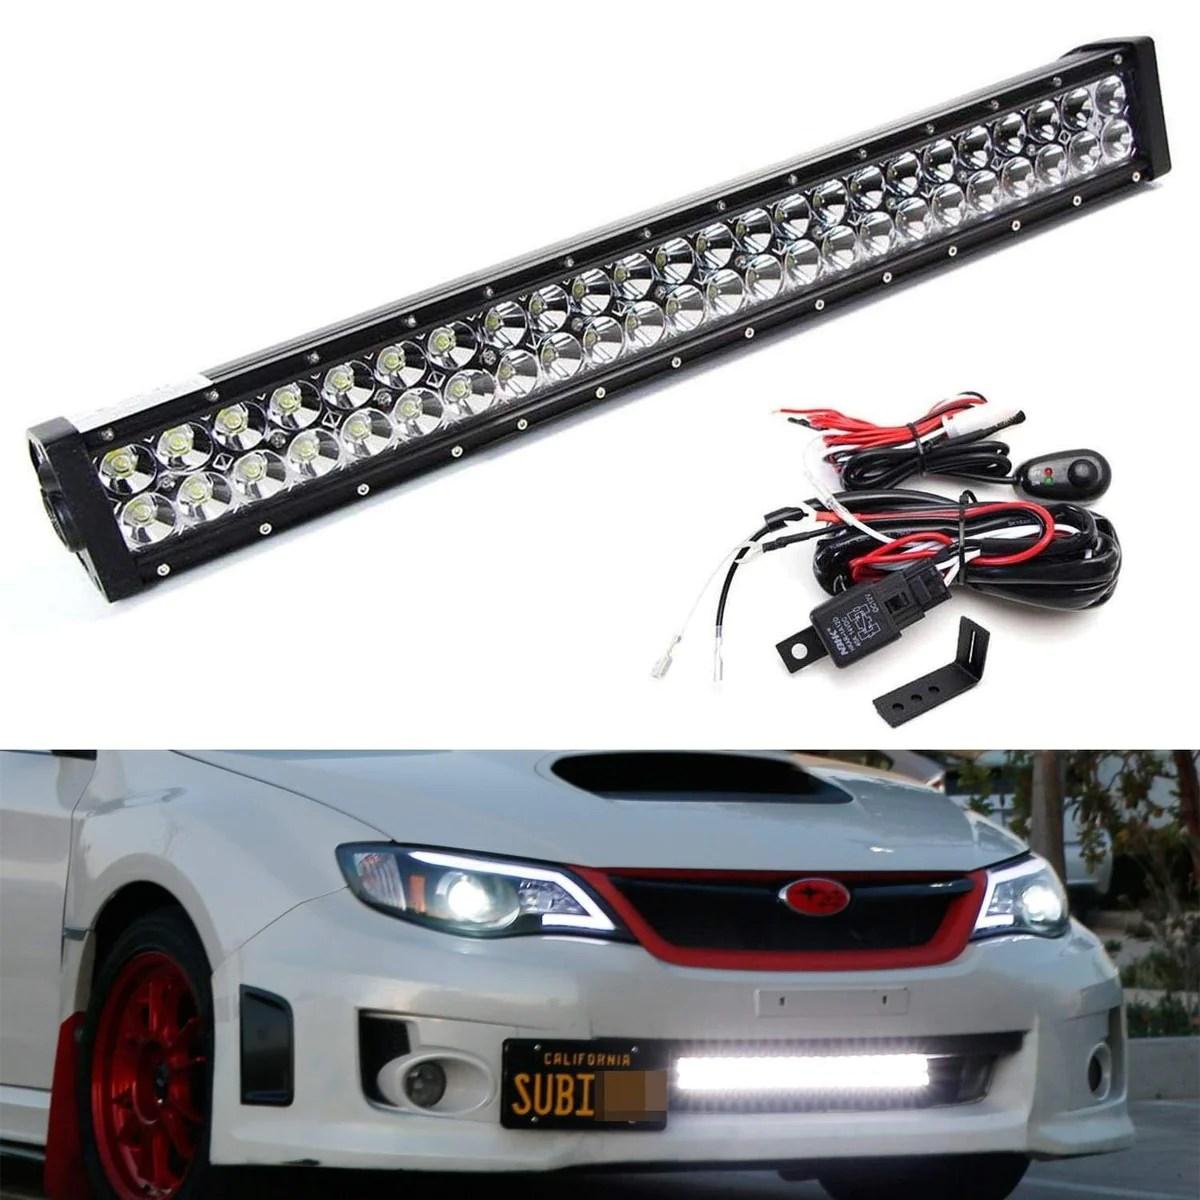 hight resolution of 11 14 subaru impreza wrx sti lower bumper led light bar kit ijdmtoy com